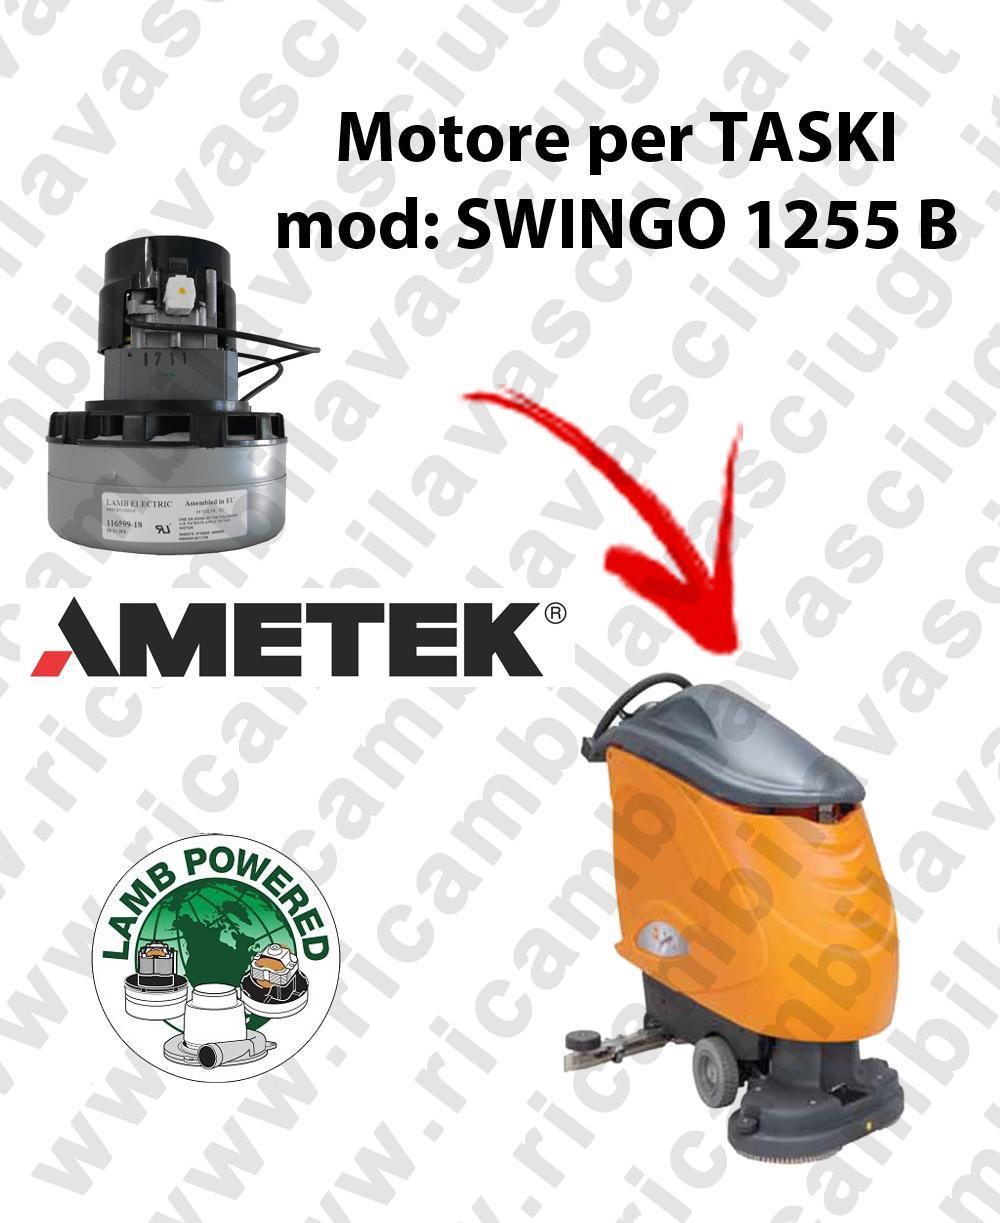 SWINGO 1255 B Motore de aspiración LAMB AMETEK para fregadora TASKI